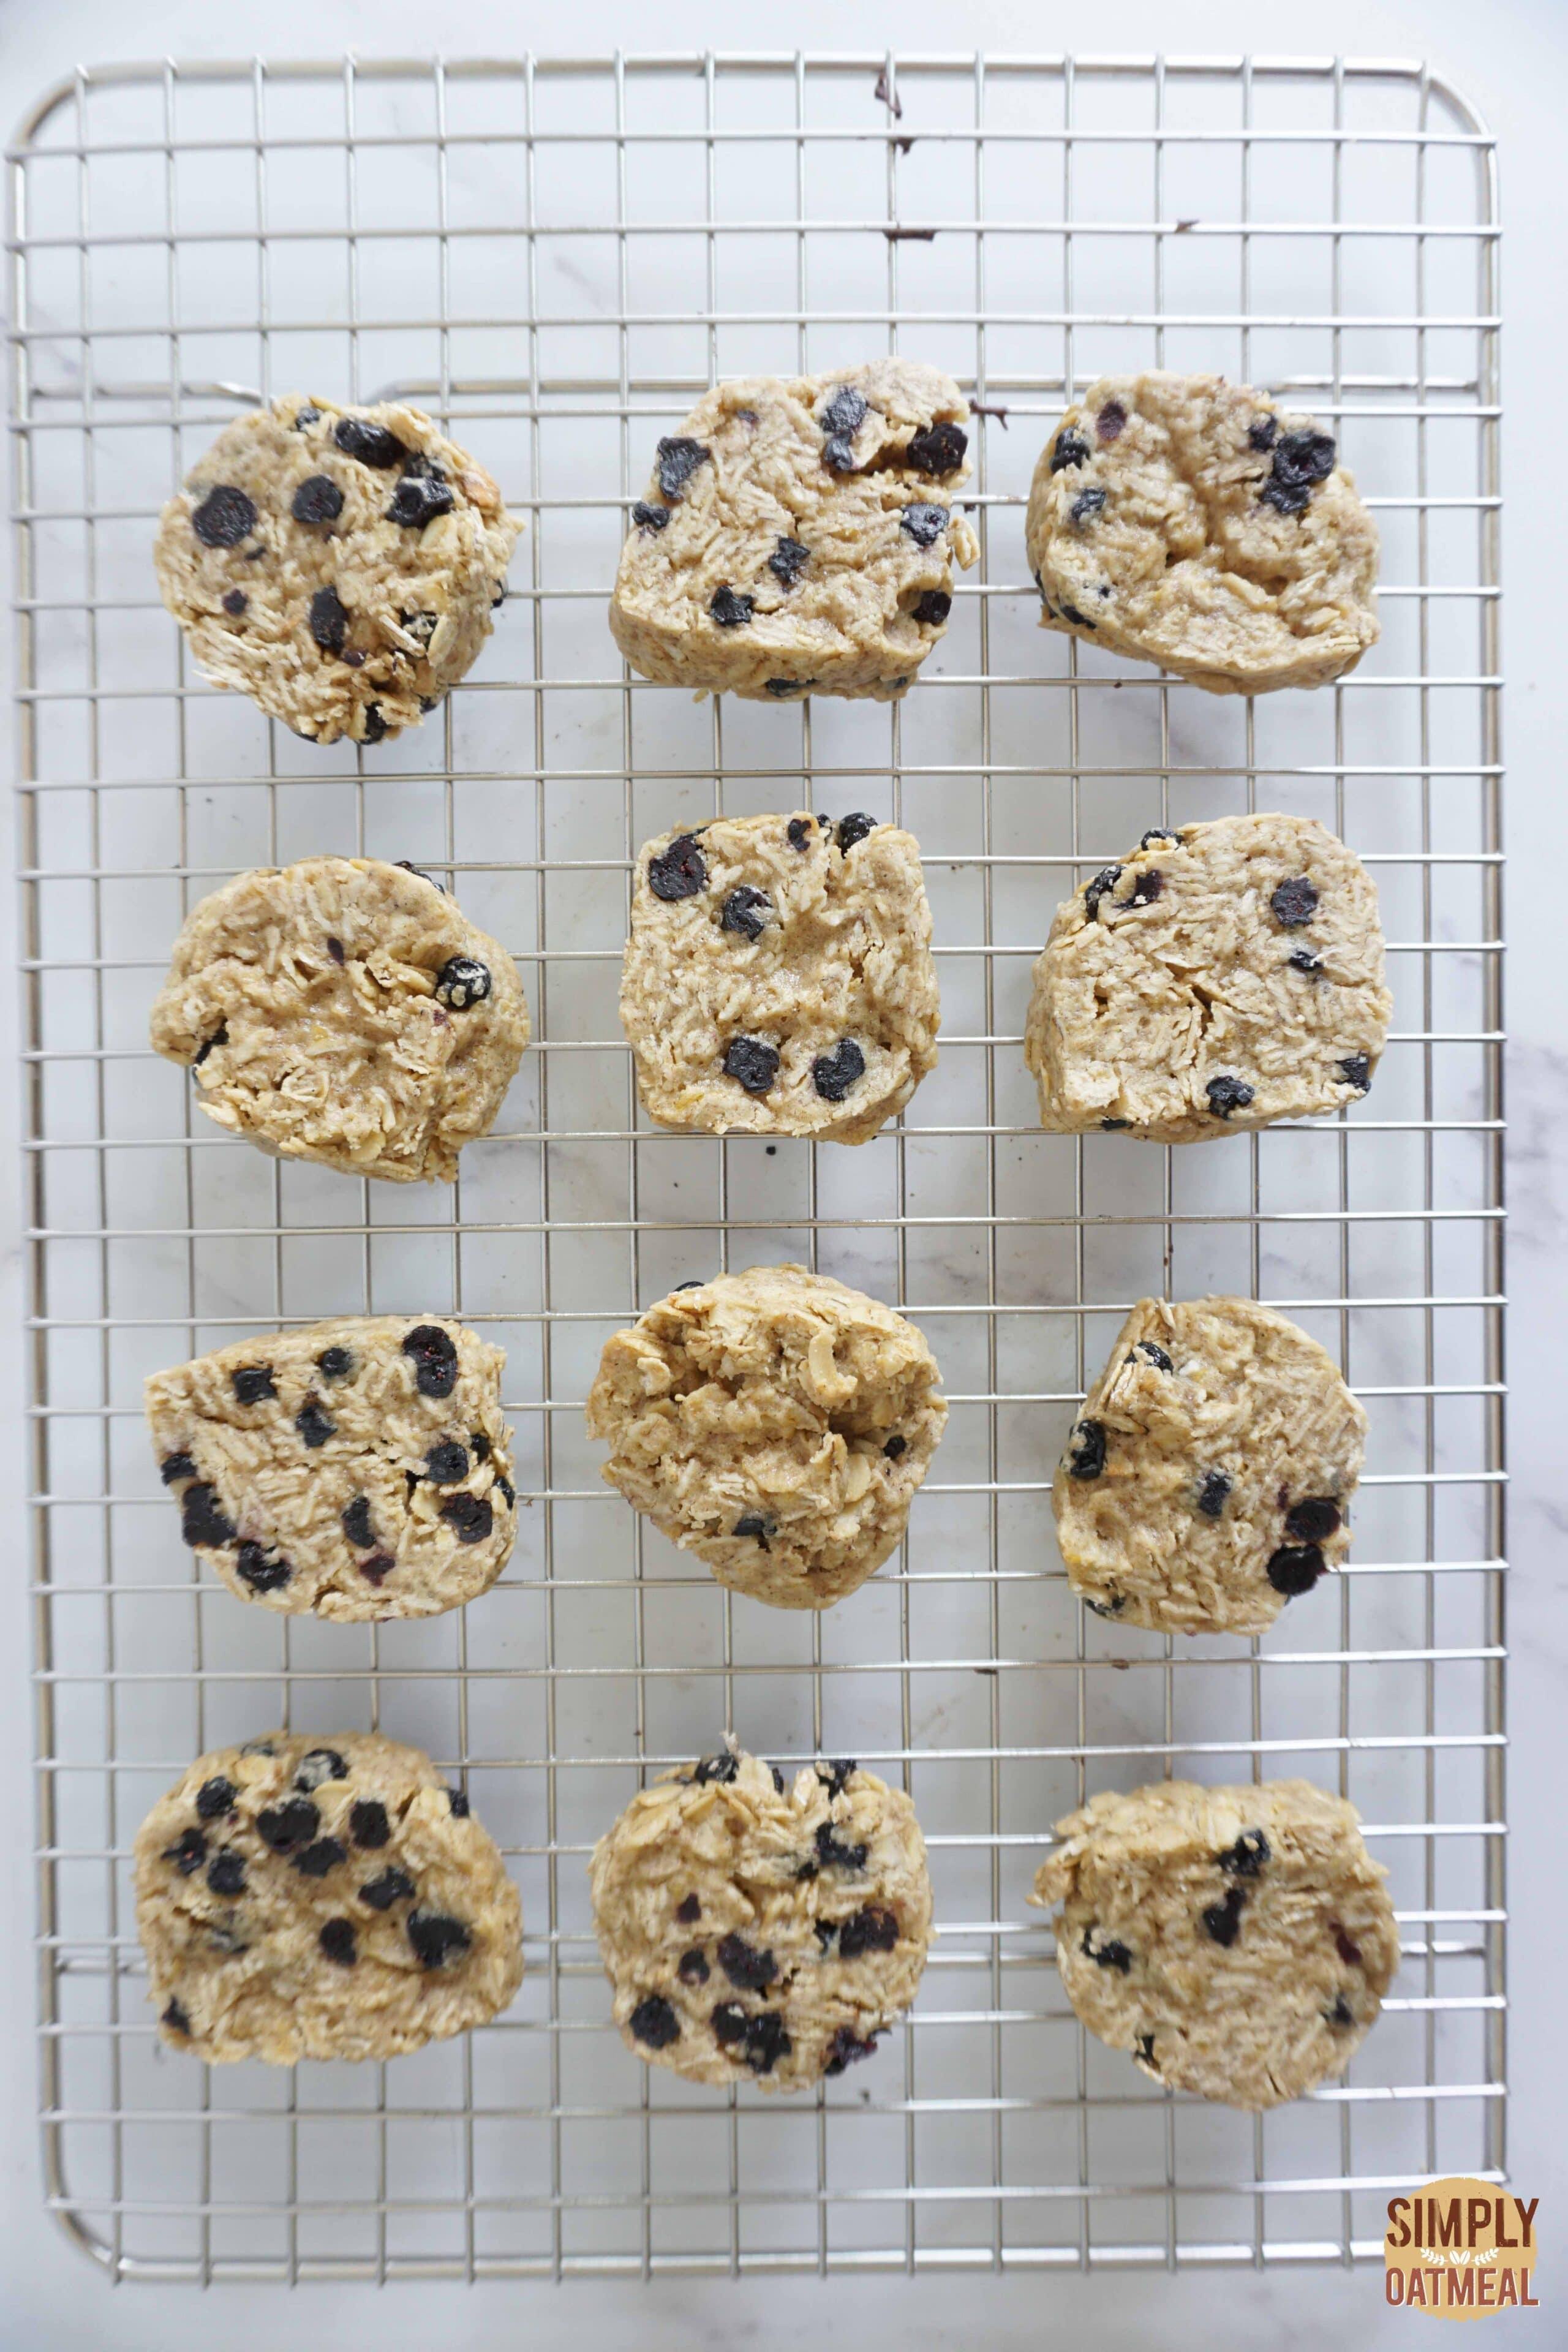 Fresh blueberry lemon oatmeal cookies on a wire rack.